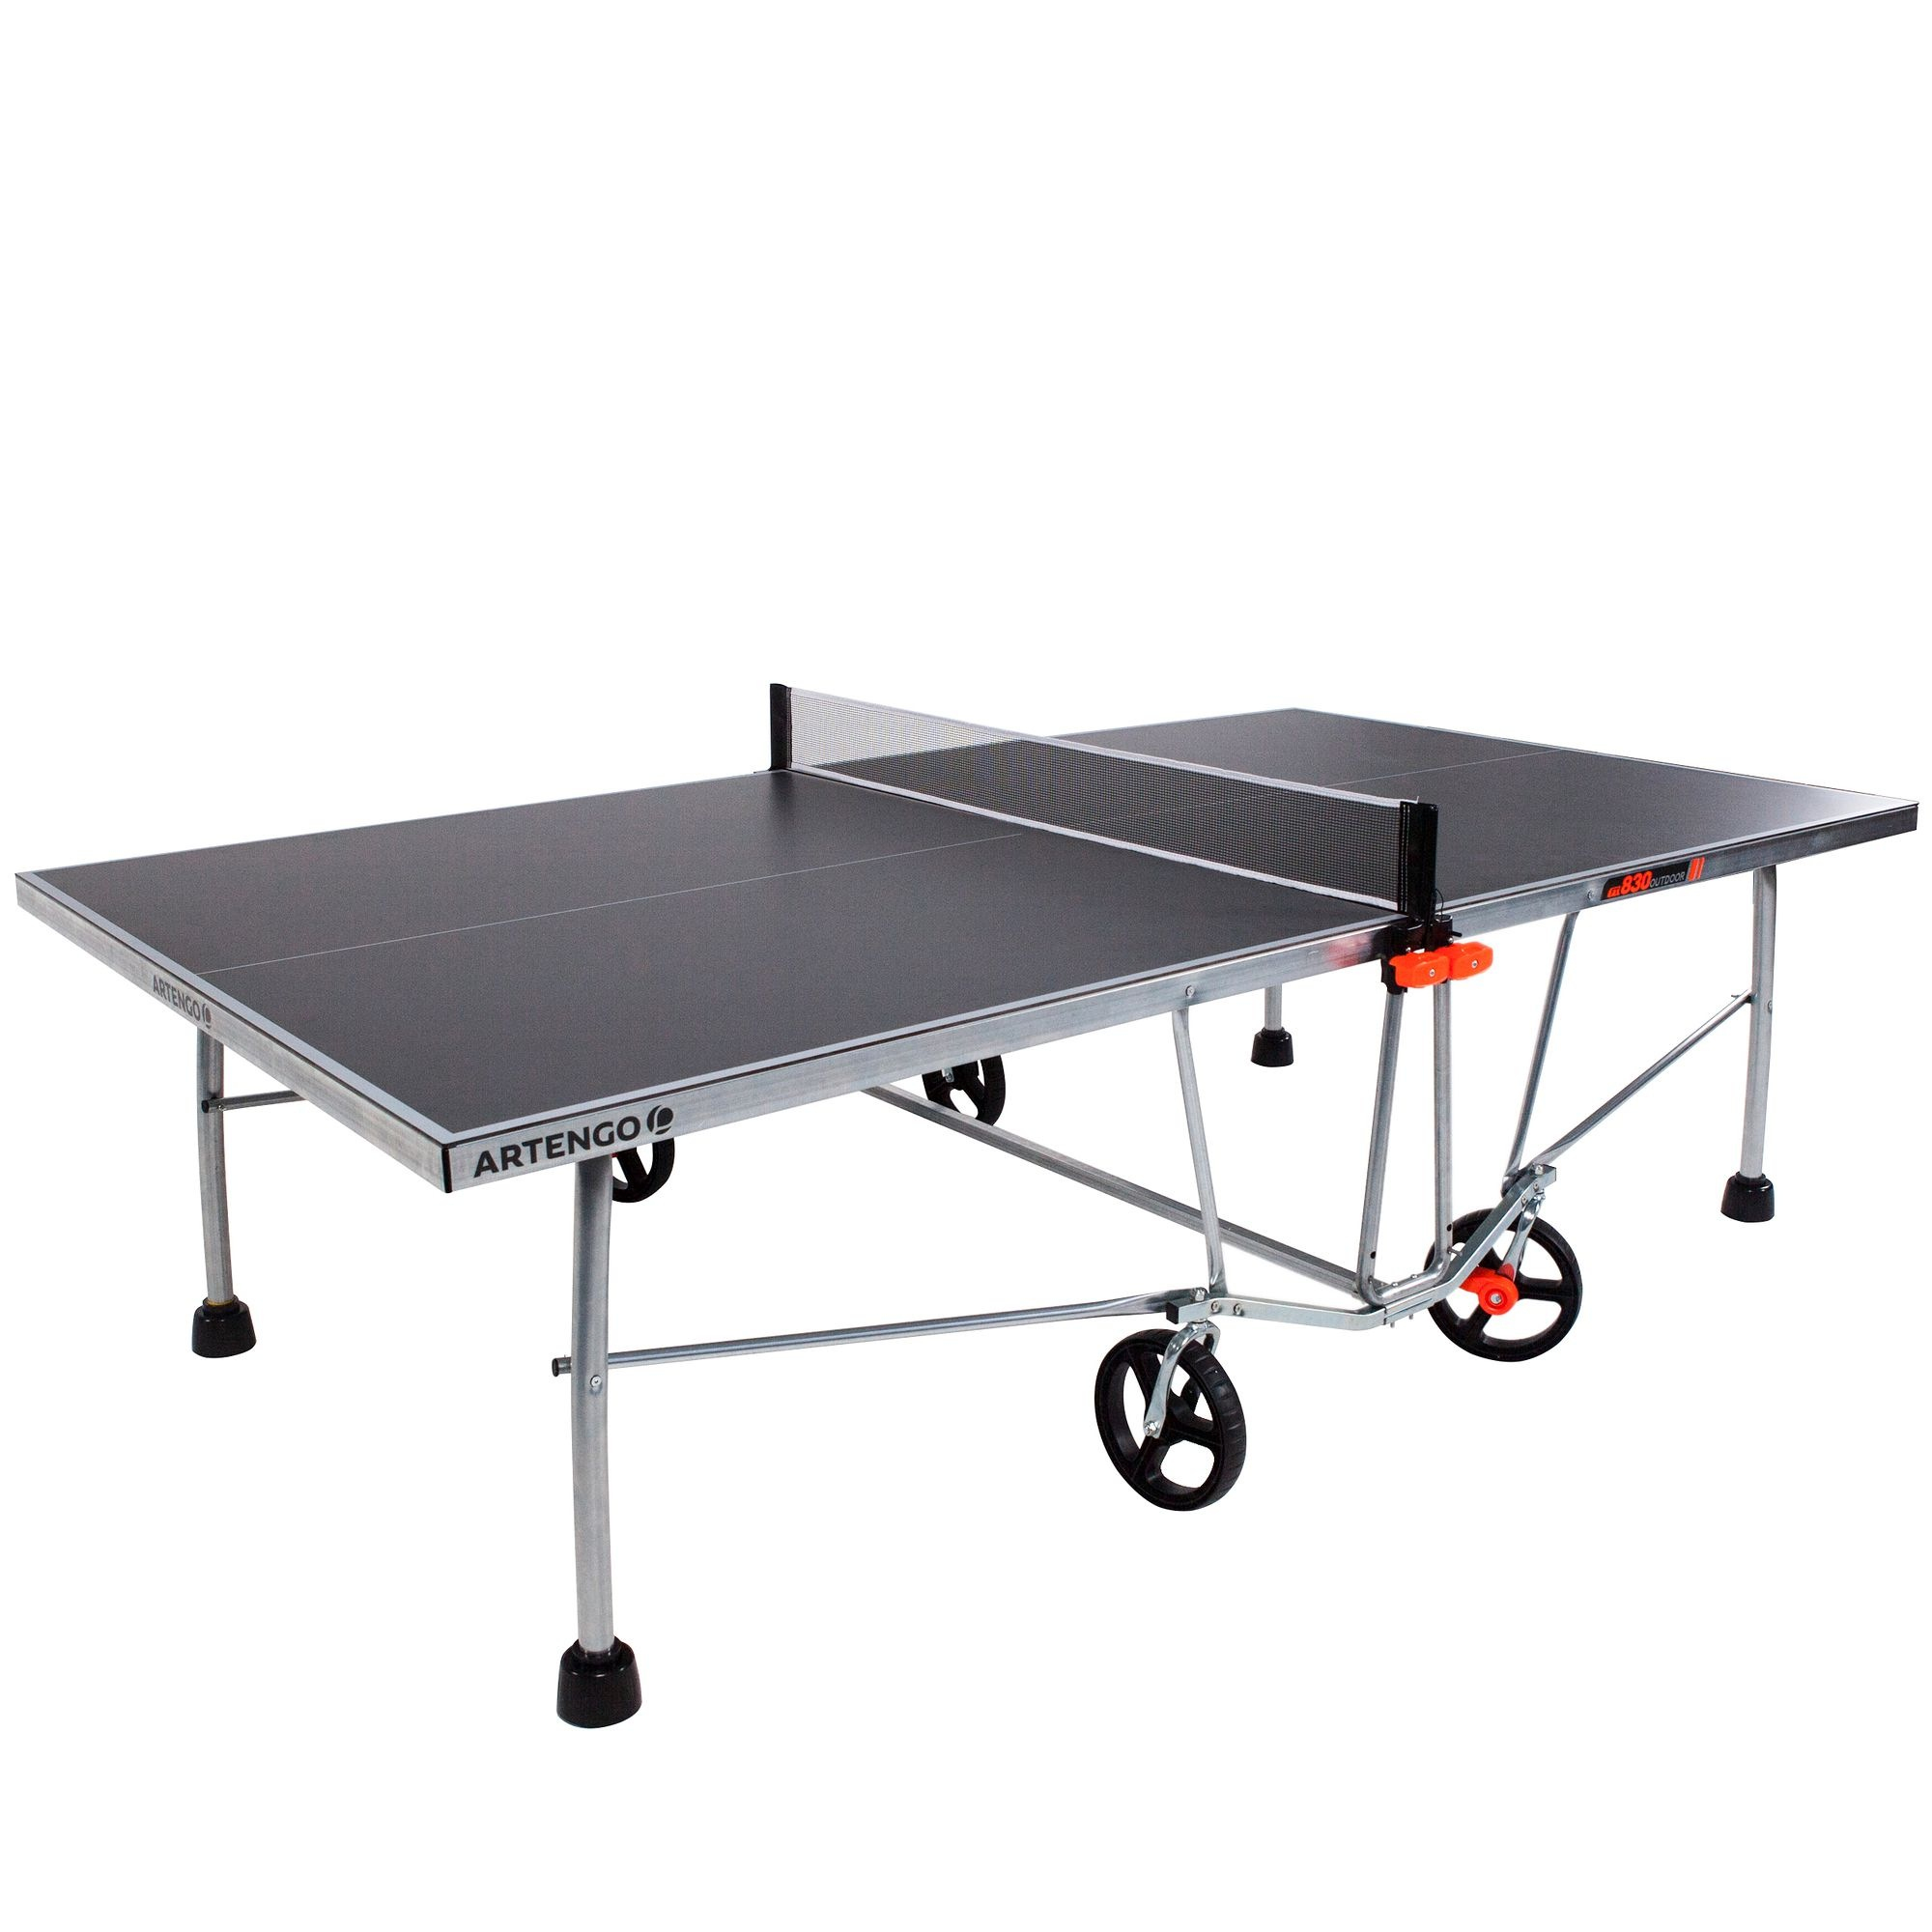 Table De Ping Pong Exterieur Occasion Luxe Photos Table De Ping Pong Cornilleau Exterieur Frais Table De Ping Pong D